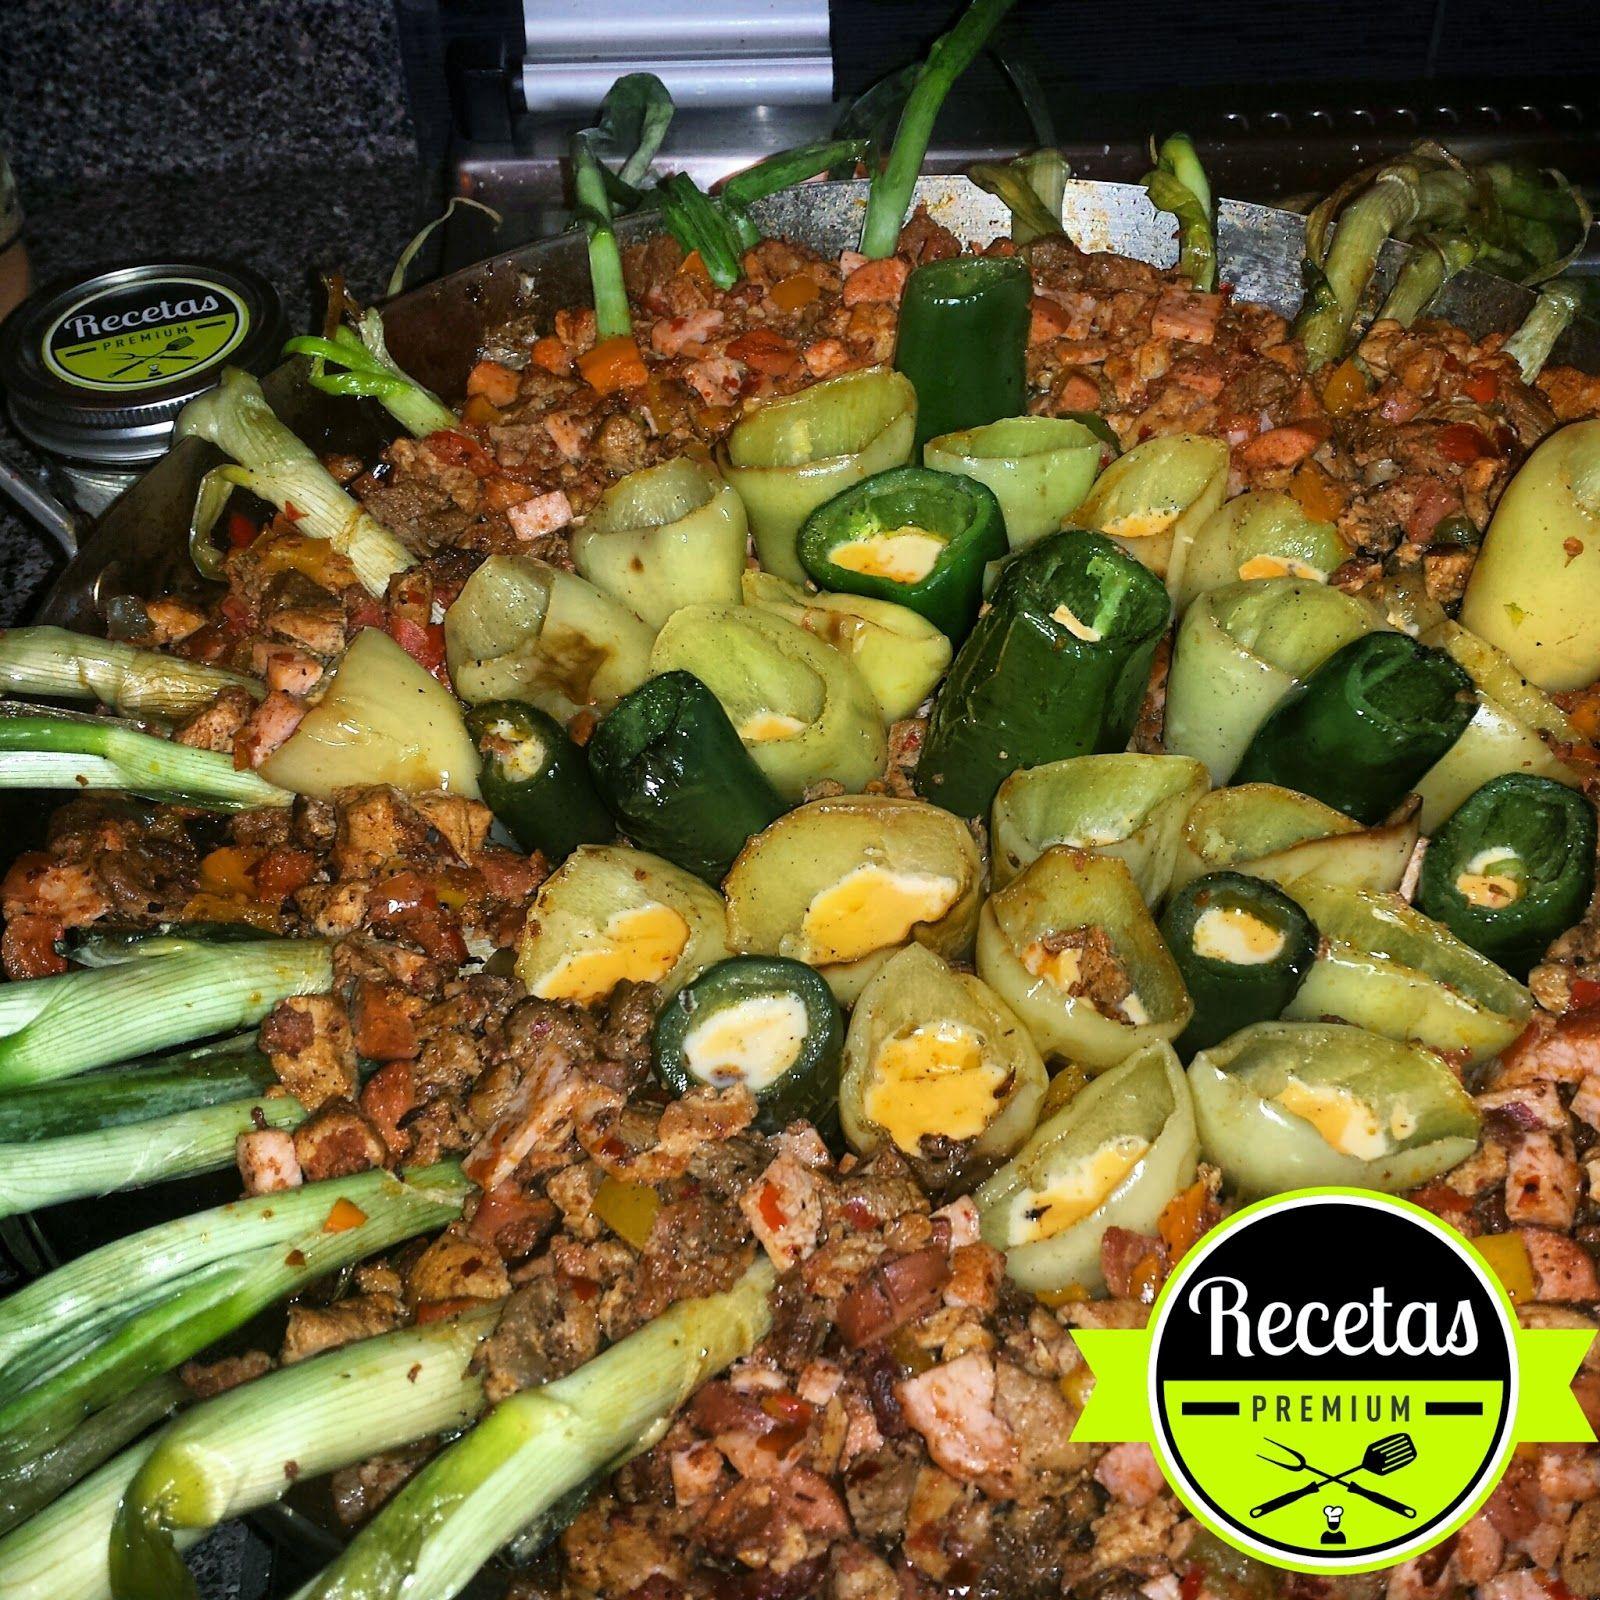 Recetas premium discada discada pinterest comida for Ingredientes para comida